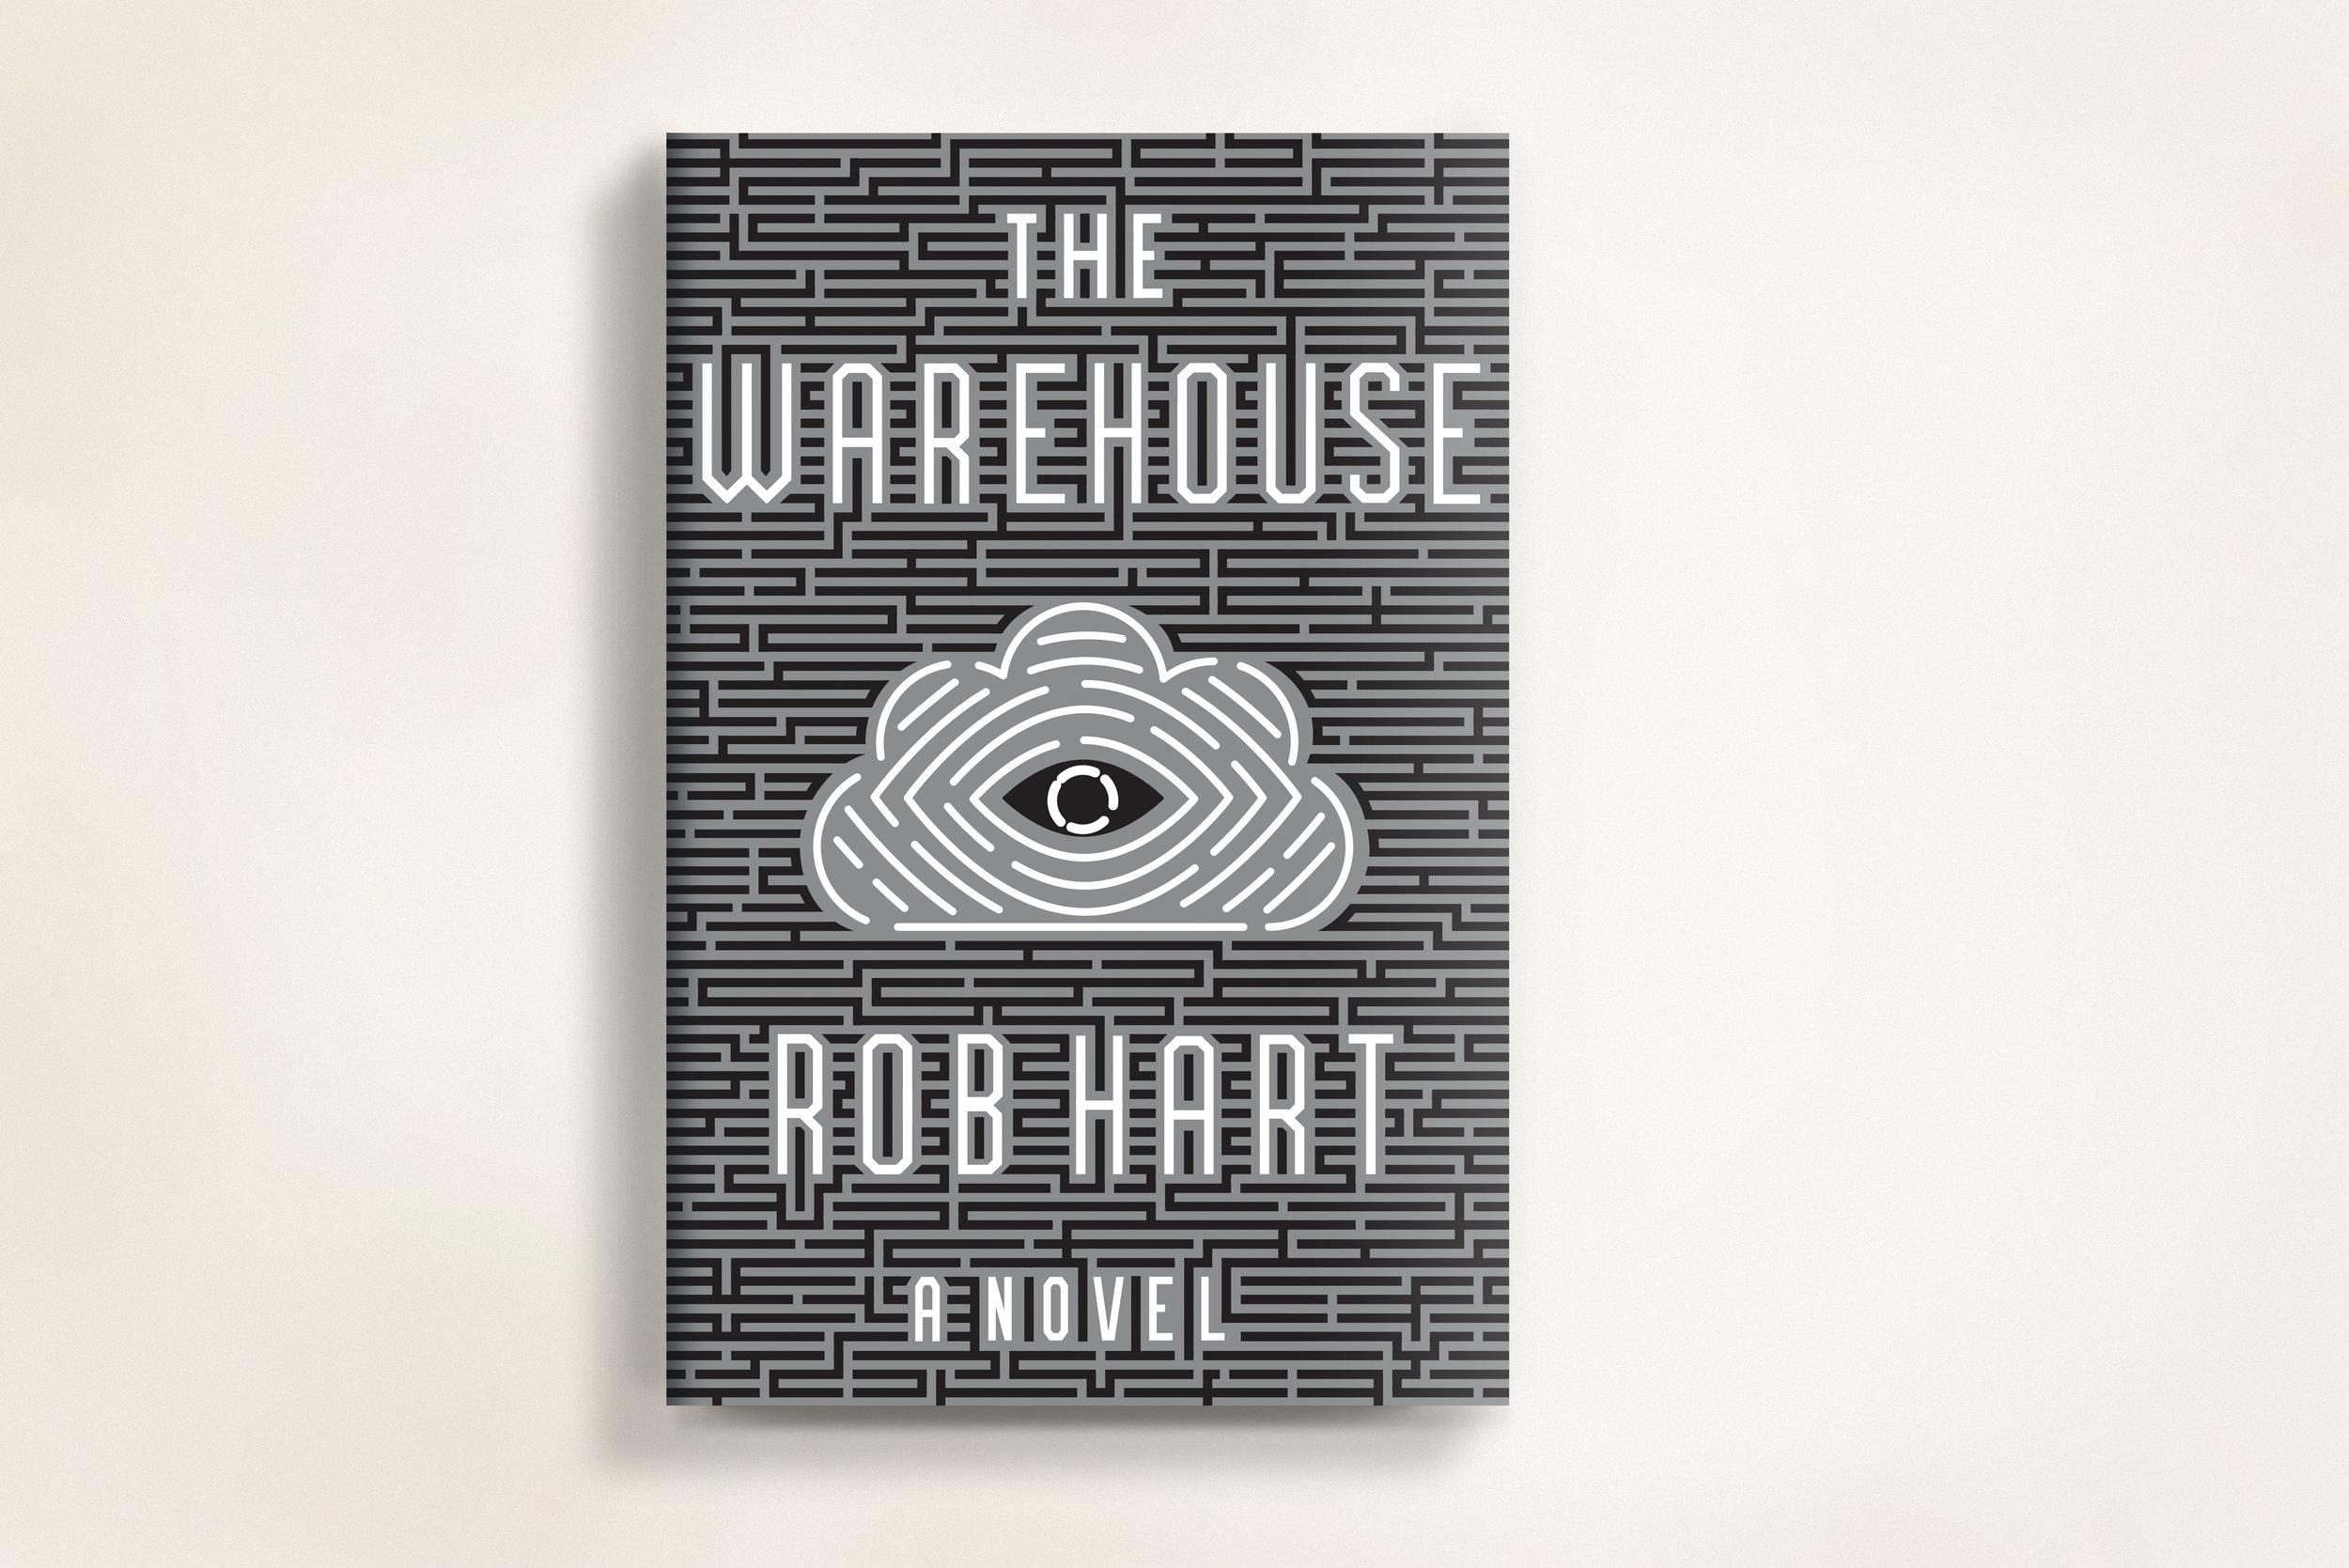 Warehouse_4.jpg